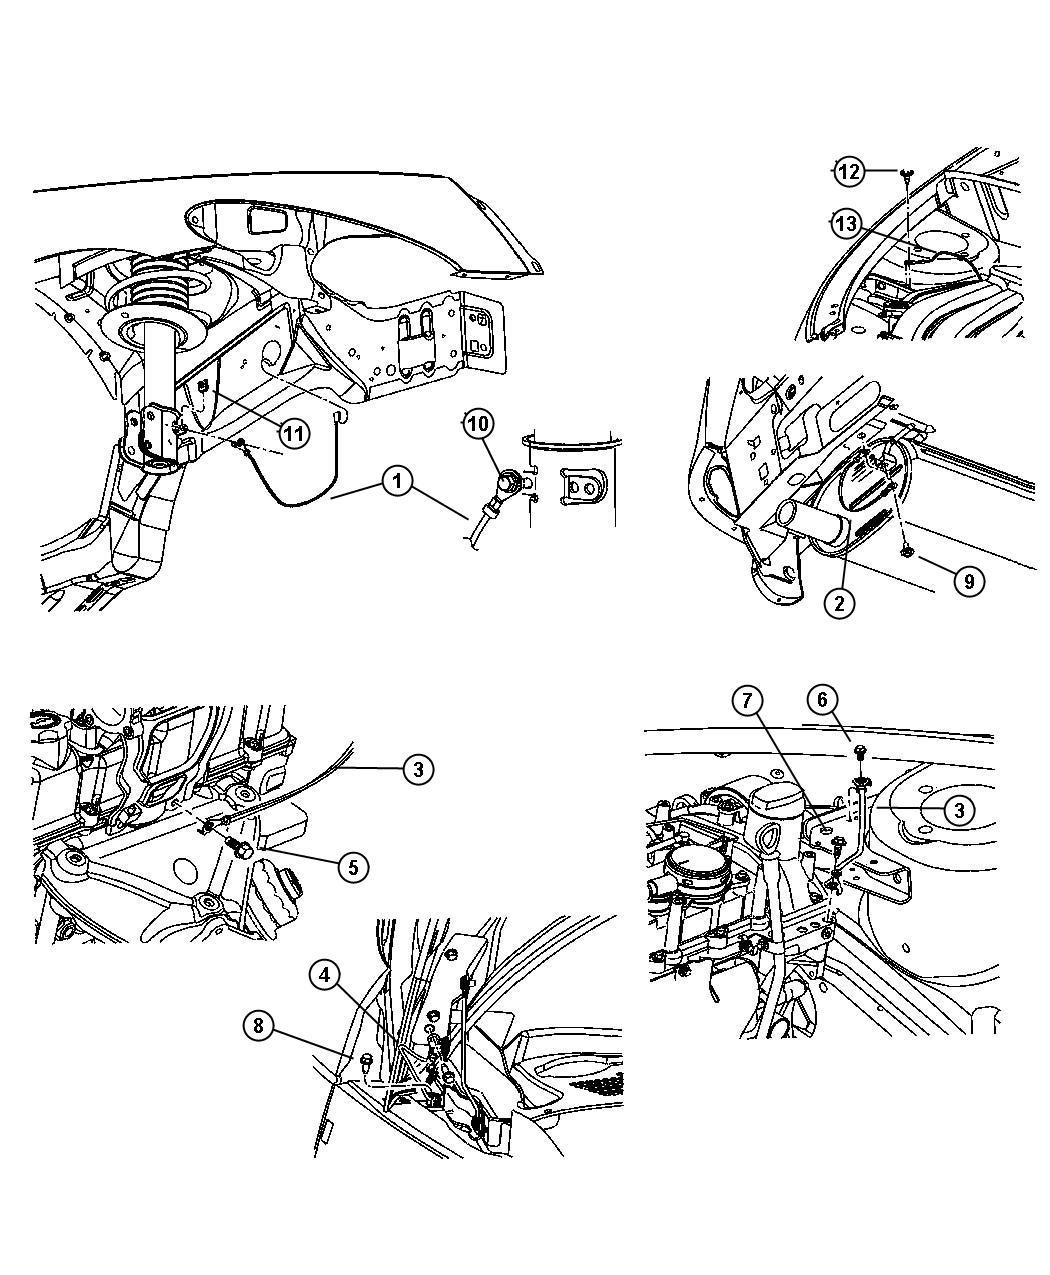 Chrysler Pt Cruiser Strap Ground Engine To Body